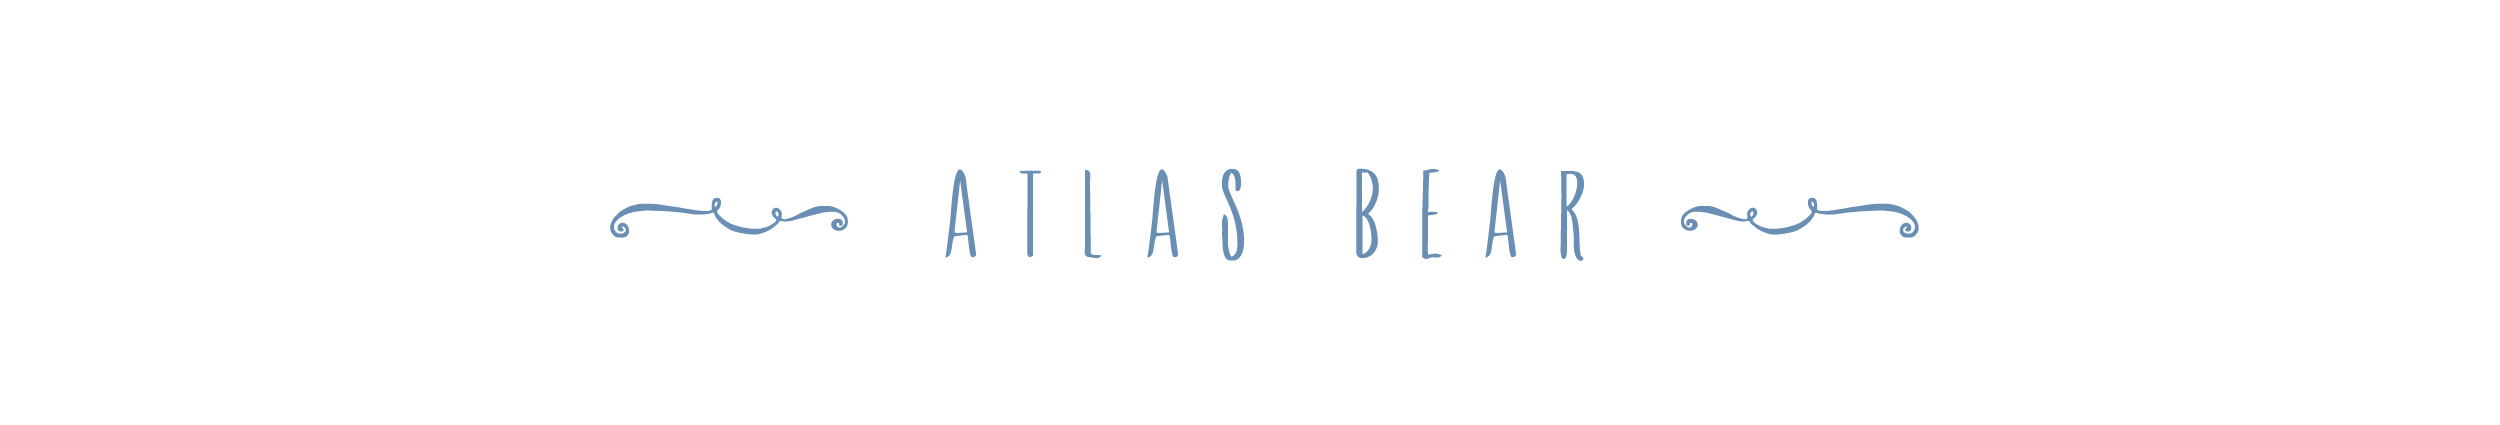 Atlas Bear Banner2-01HRC